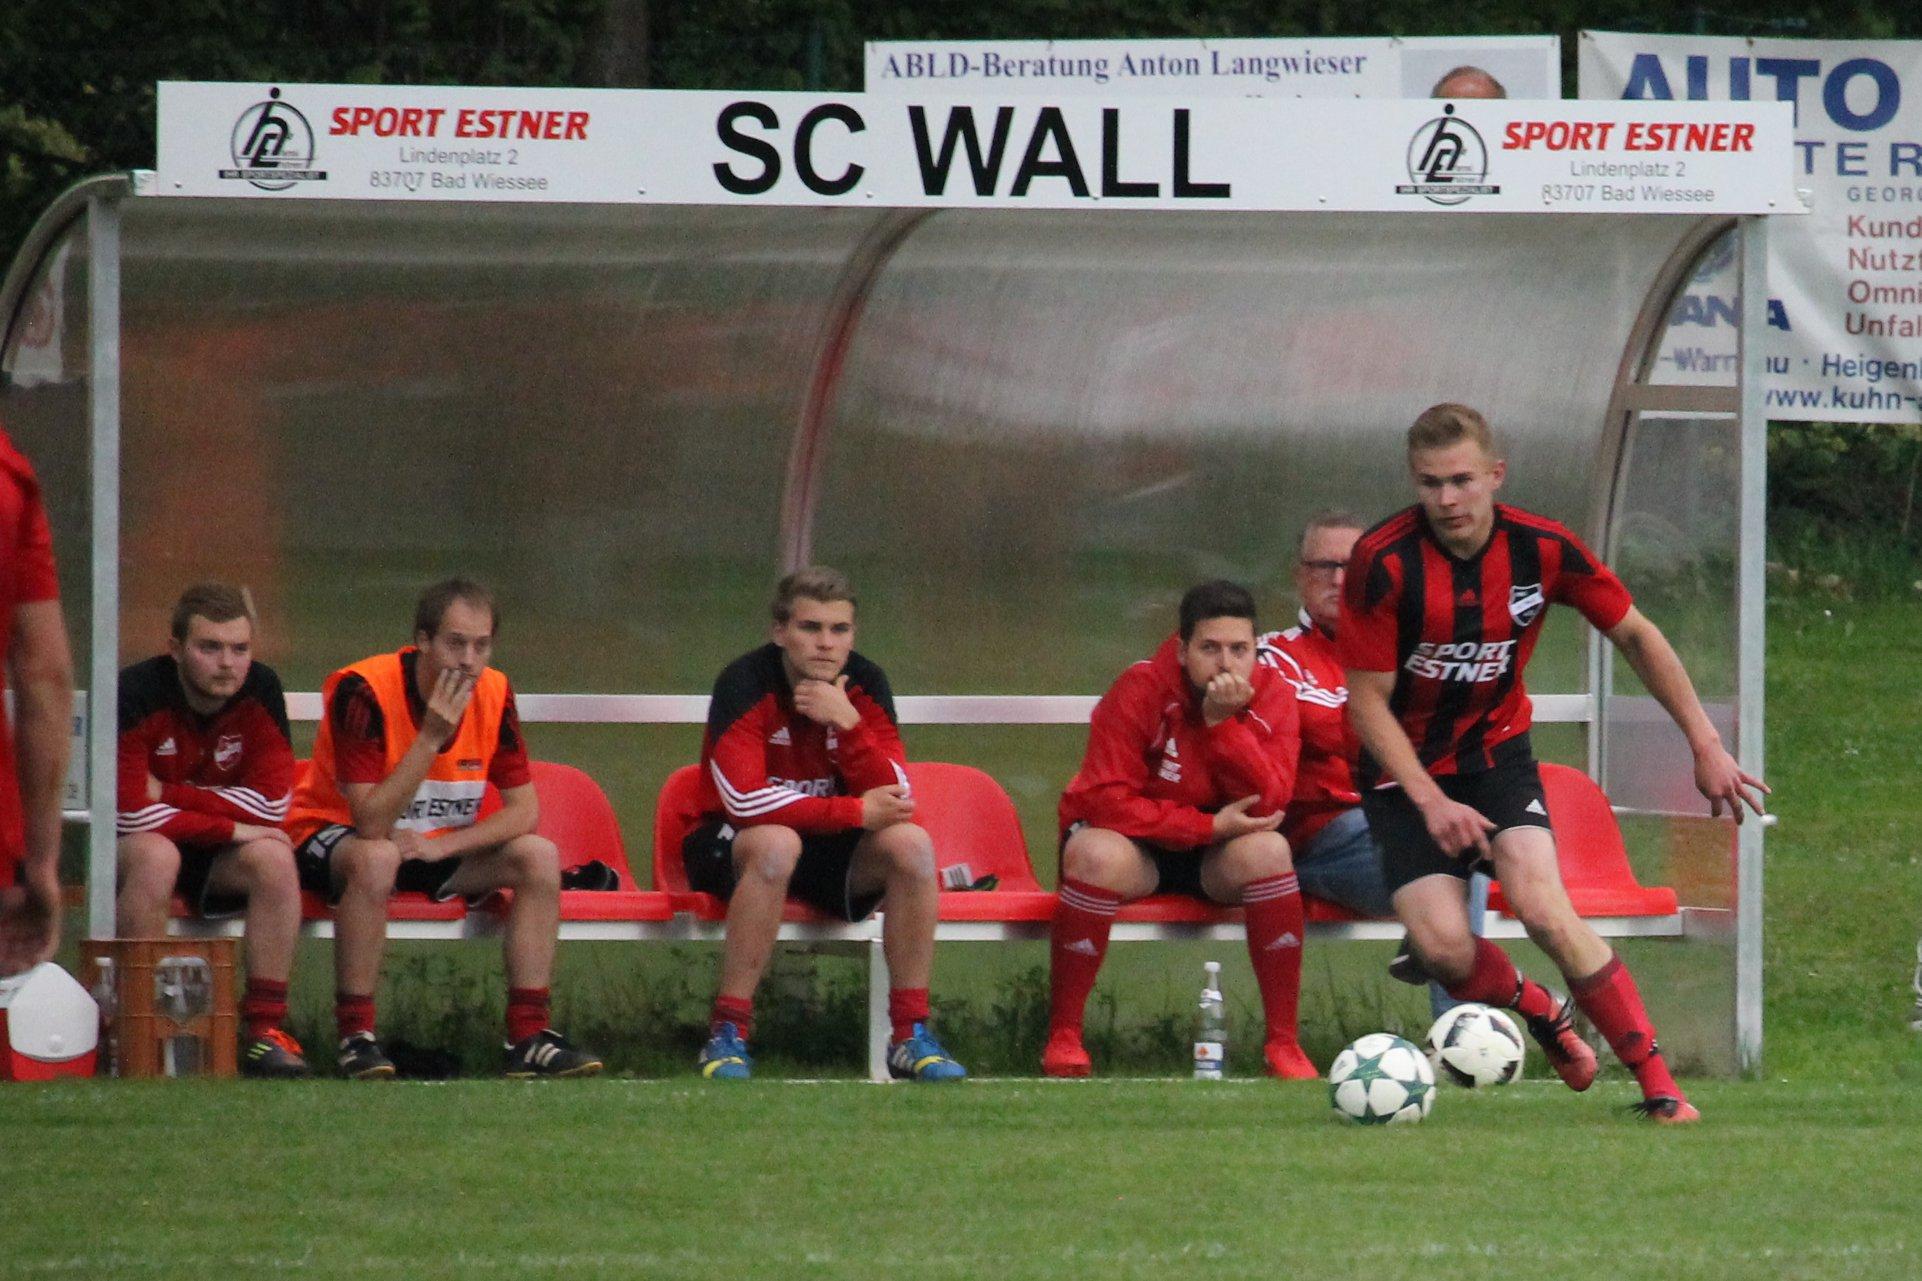 Gegen den SV Wackersberg (0:3) am 3.5.2018